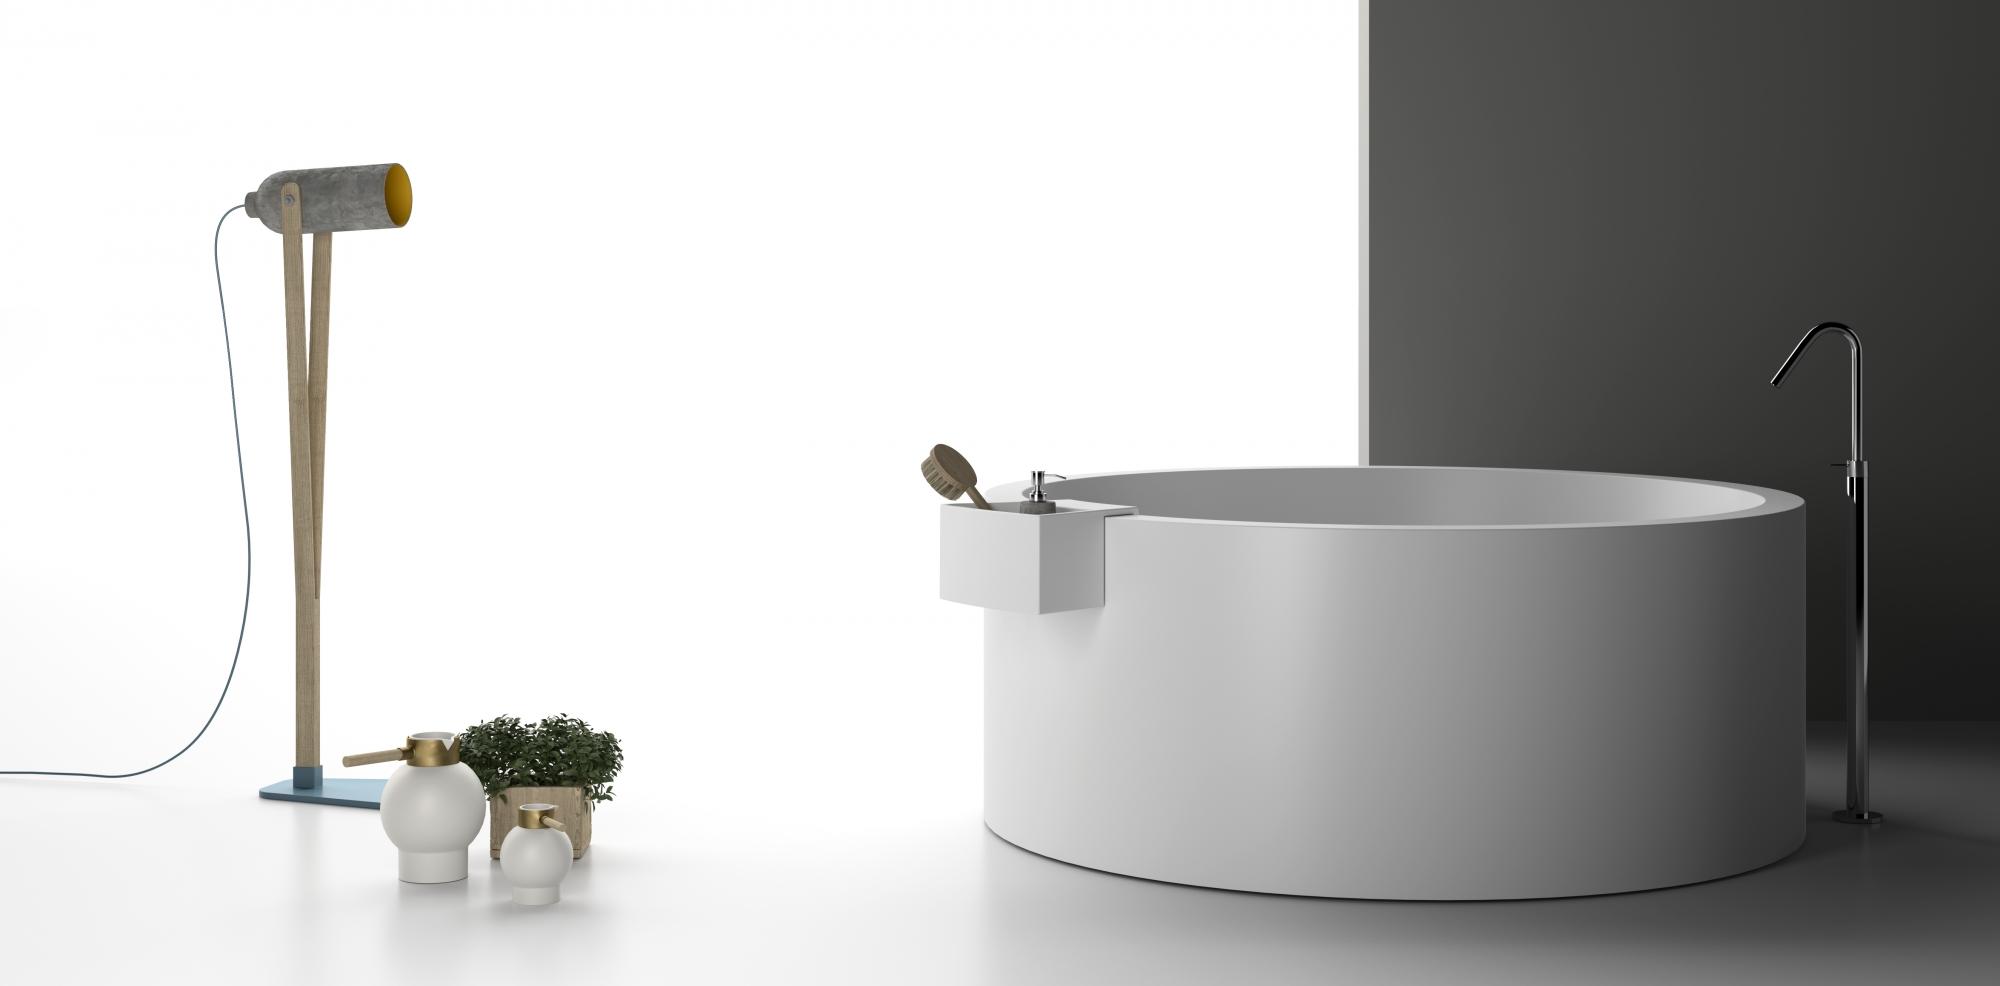 Planit presenta la vasca da bagno Marina: design di Itamar Harari ...